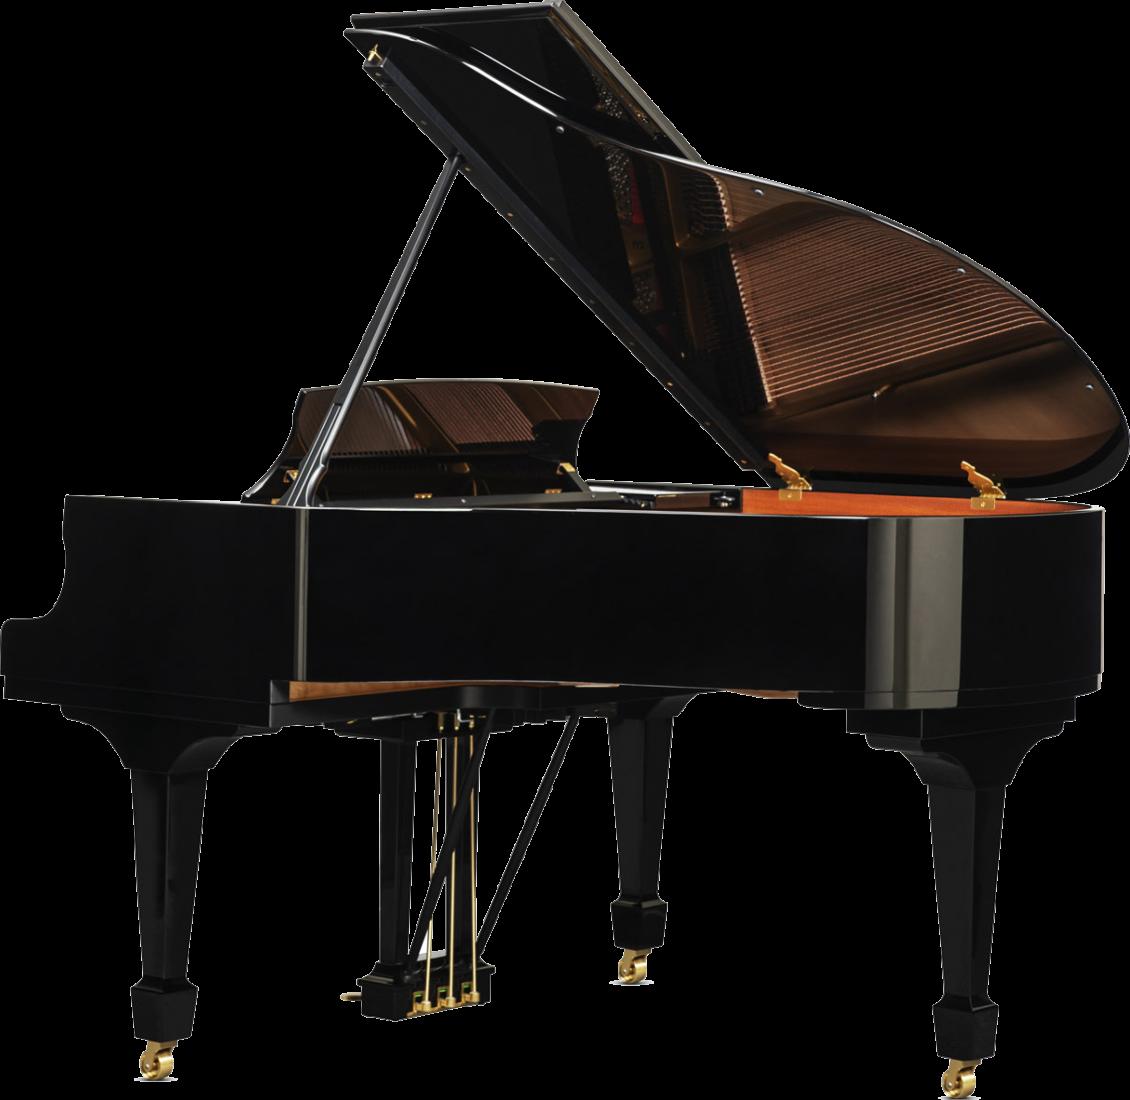 piano-cola-steinway-sons-s155-artesanal-nuevo-negro-trasera-02